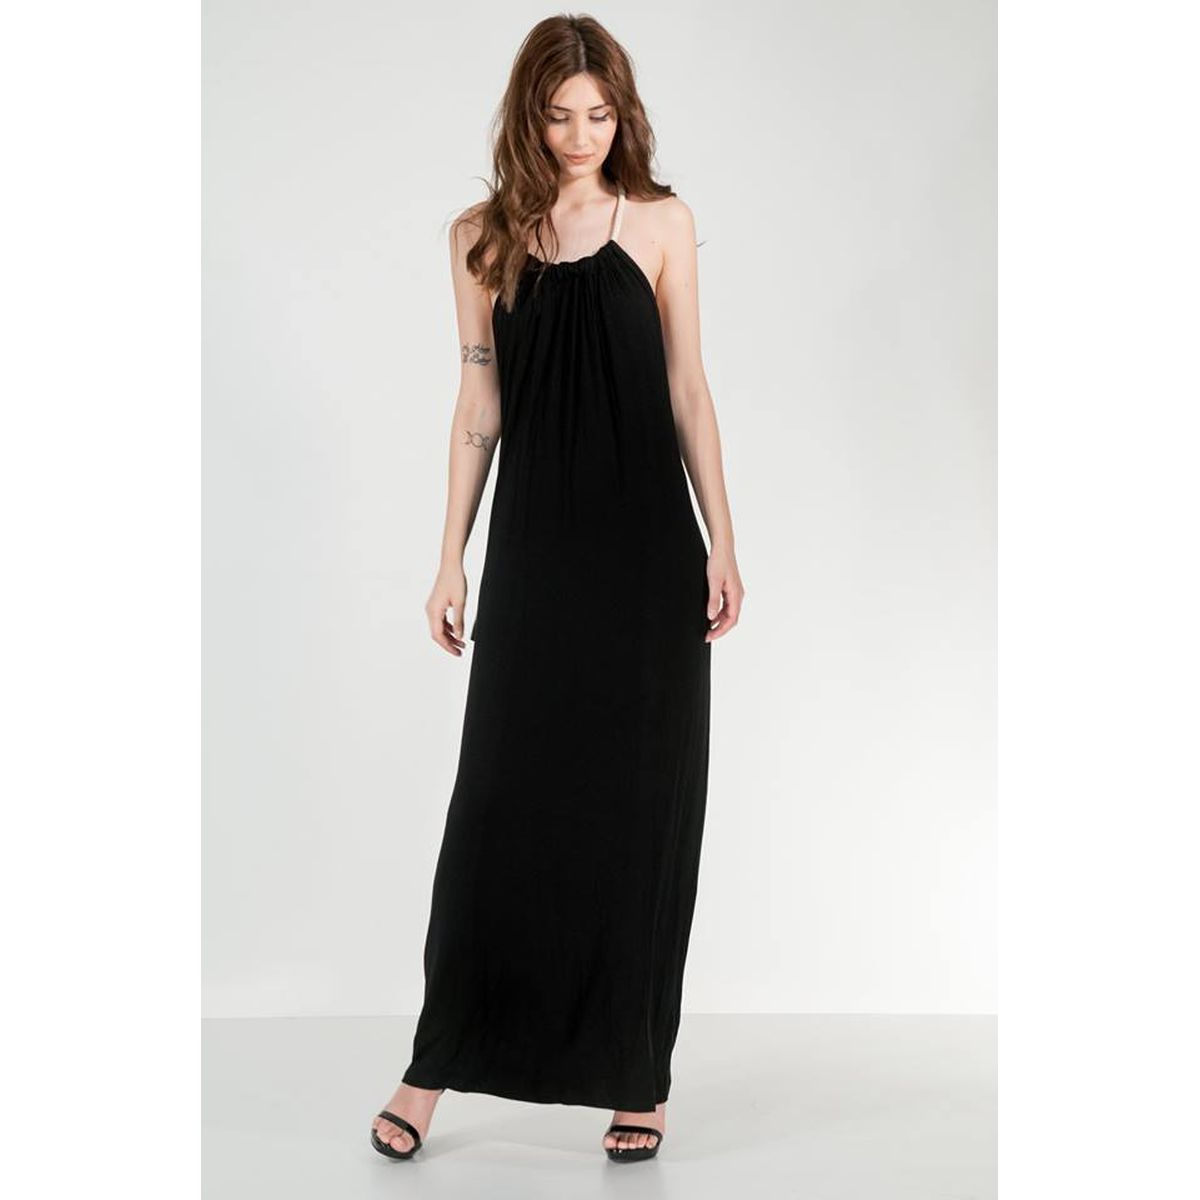 dc8728d3b58 Μαύρο φόρεμα μακρύ με ανοιχτή πλάτη - Dressme